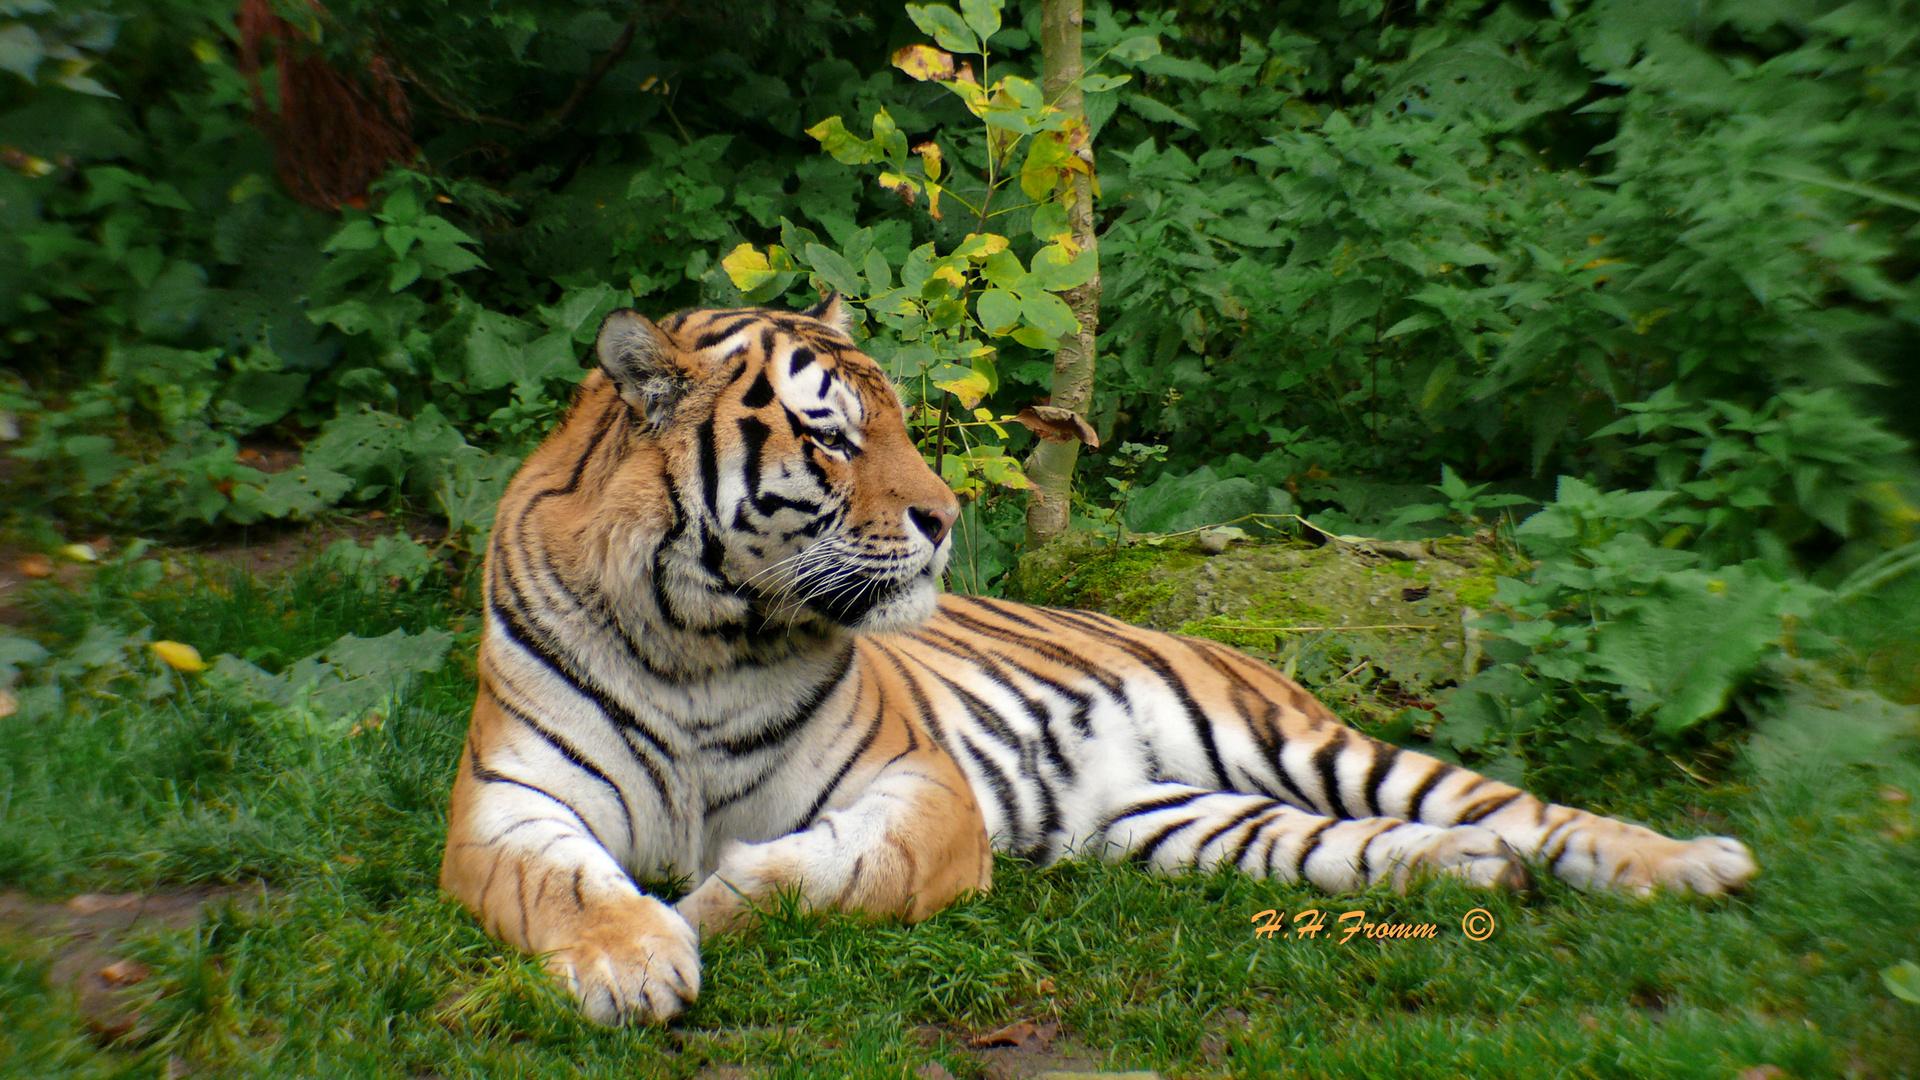 Tiger im Zoo Leipzig , Bild 2